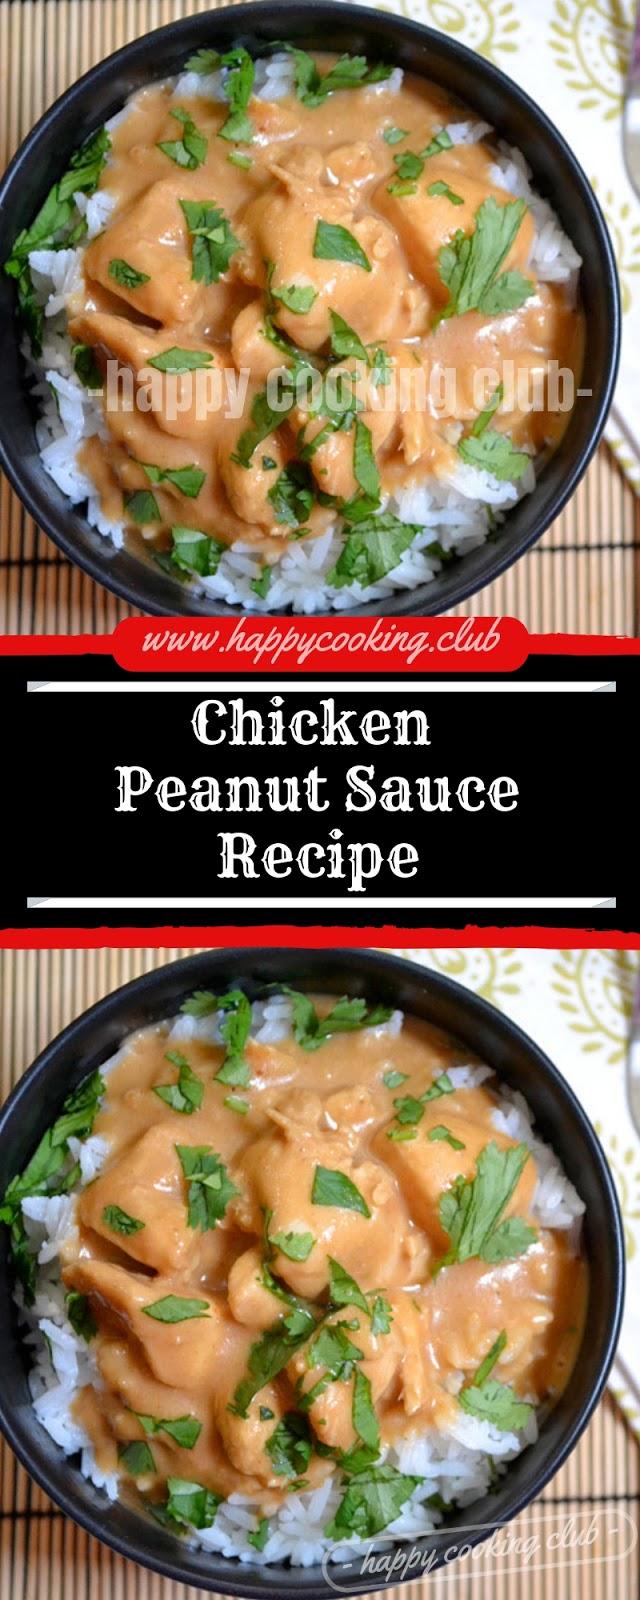 Chicken Peanut Sauce Recipe